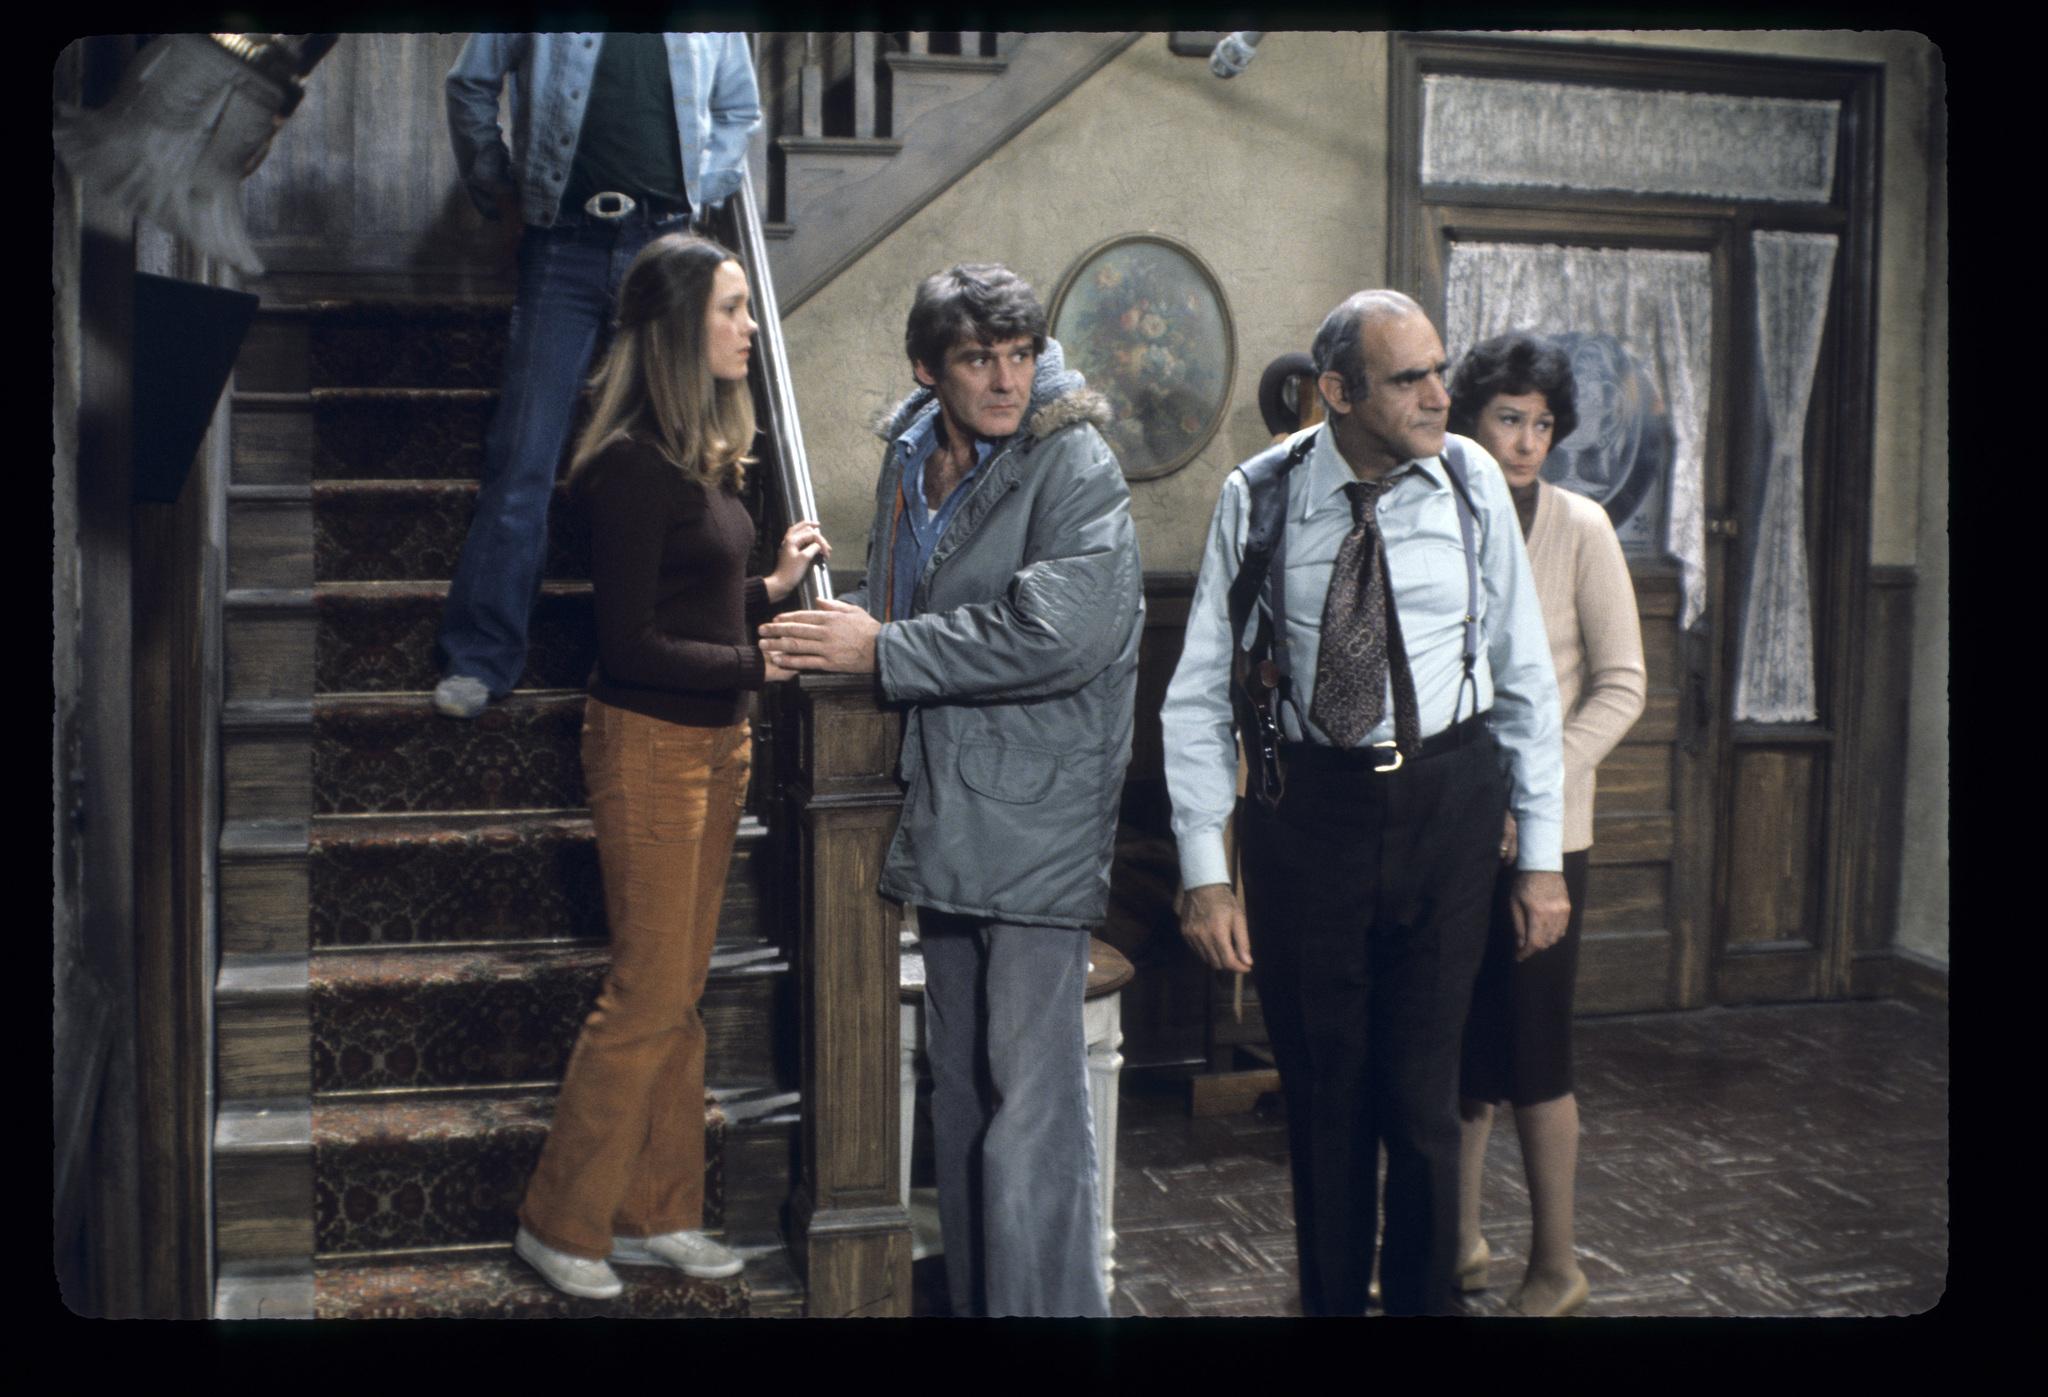 Abe Vigoda, Richard Schaal, Wendy Schaal, and Florence Stanley in Fish (1977)